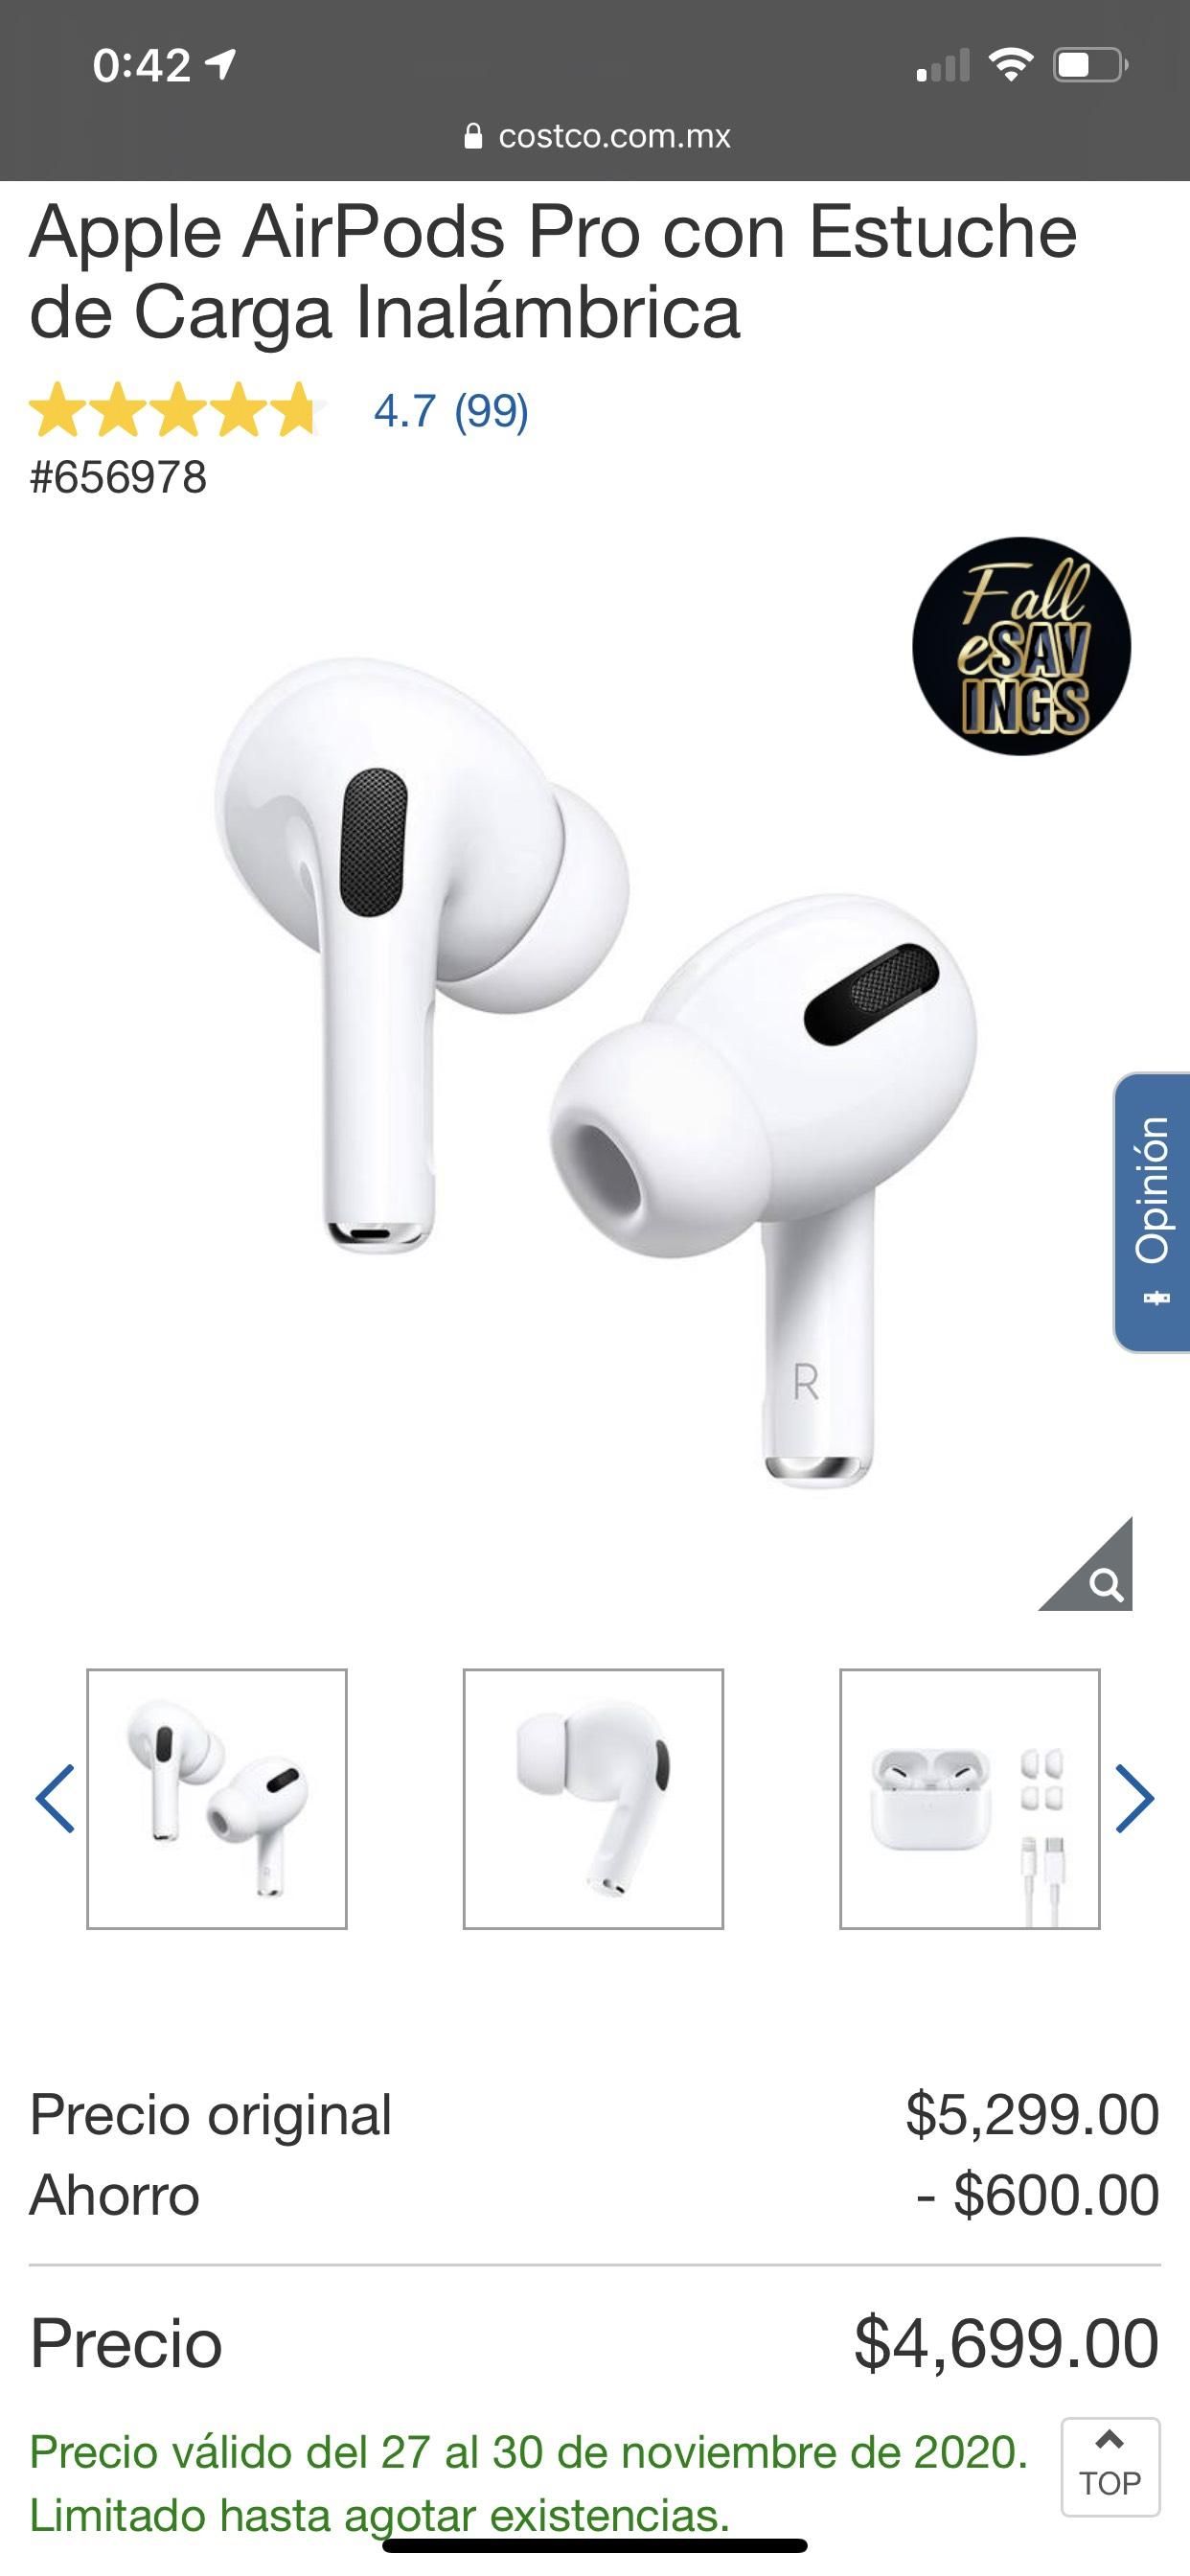 Costco Apple AirPods Pro con estuché de carga inalámbrica